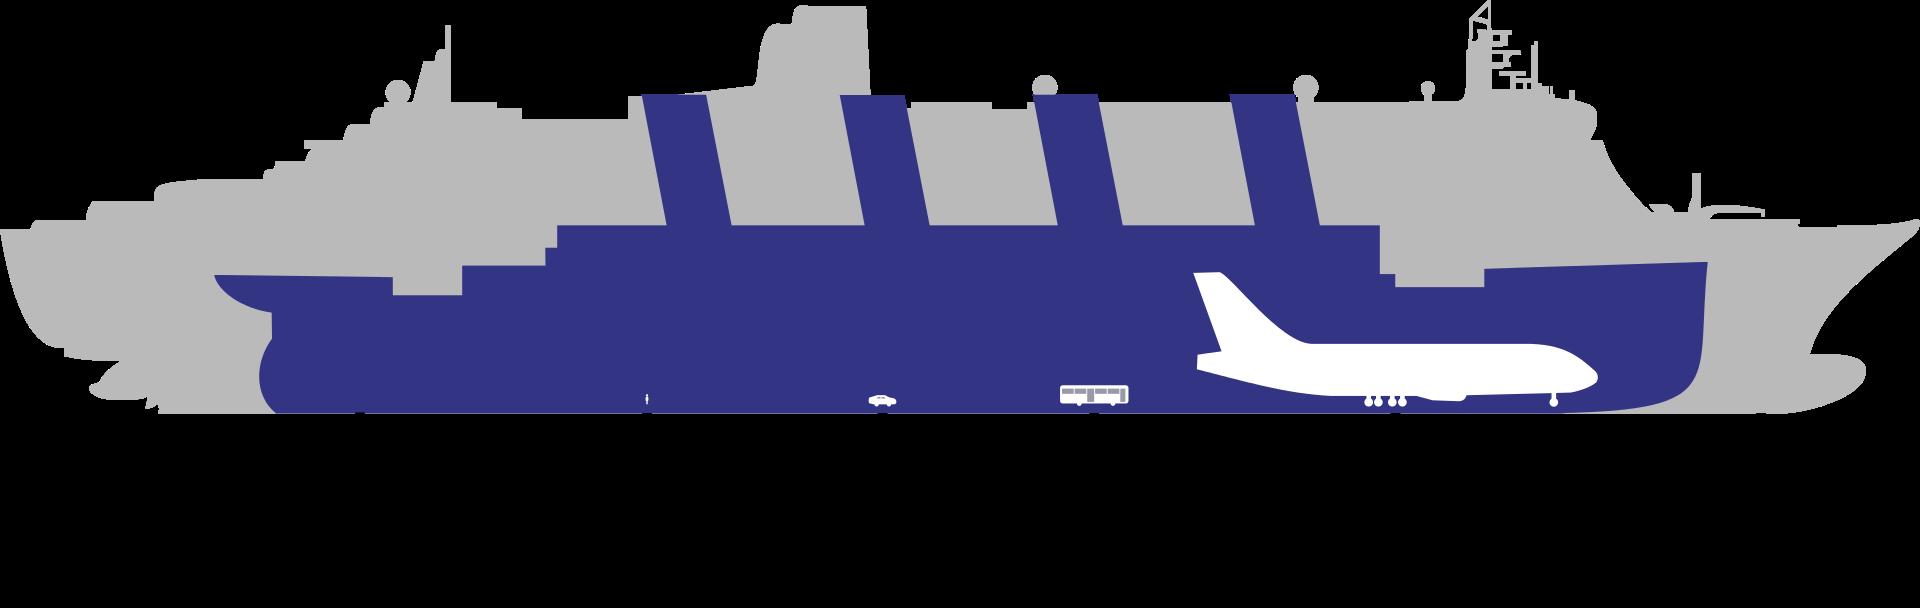 Titanic_LEGO_2016_Neozone001